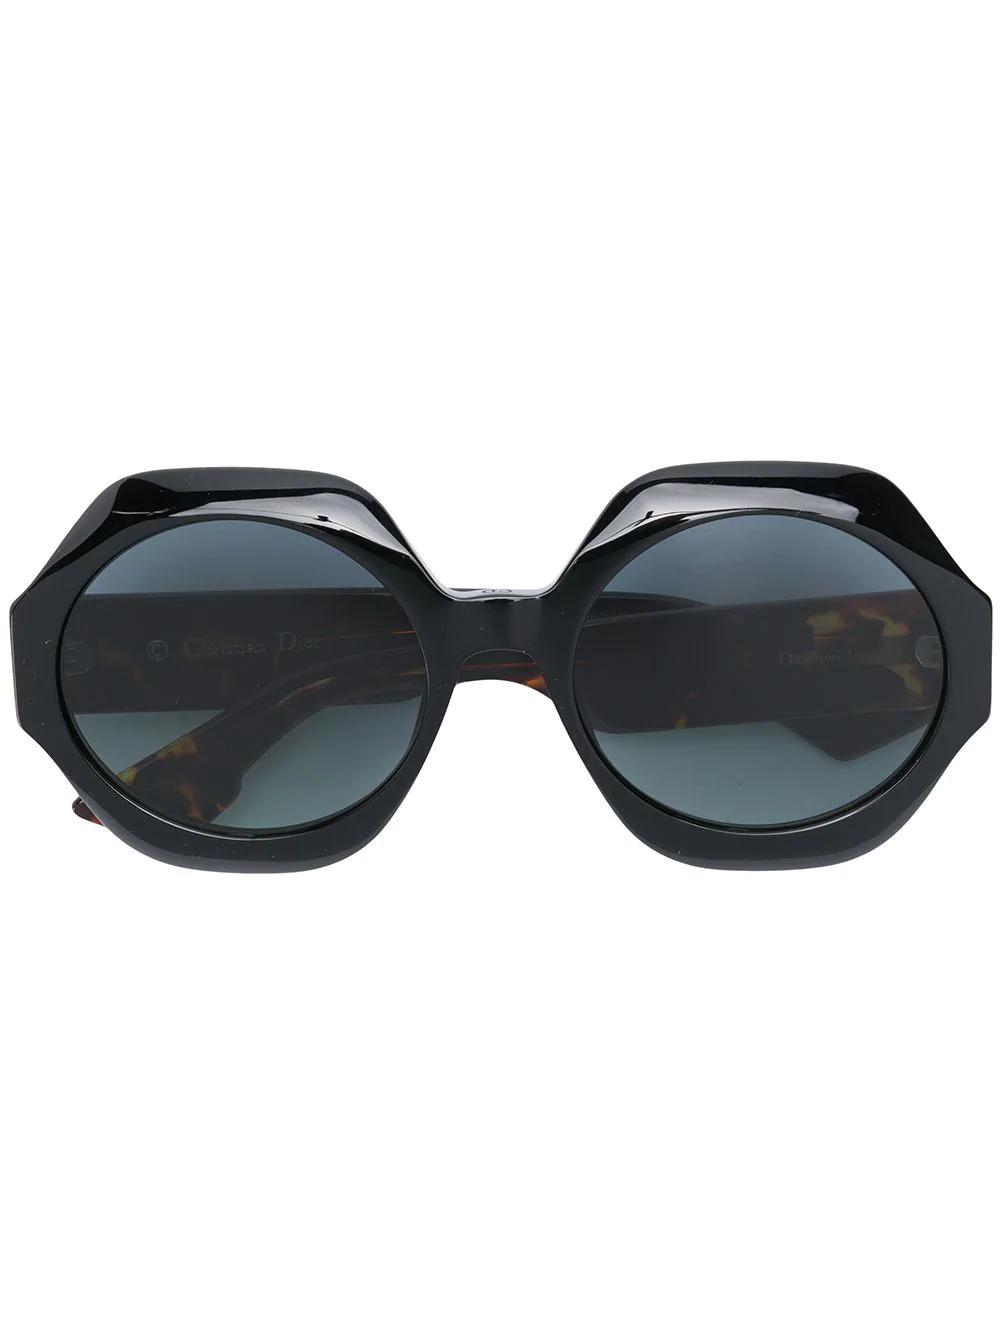 ab3bb3b94fe6 Dior Eyewear Spirit 1 Sunglasses - Black